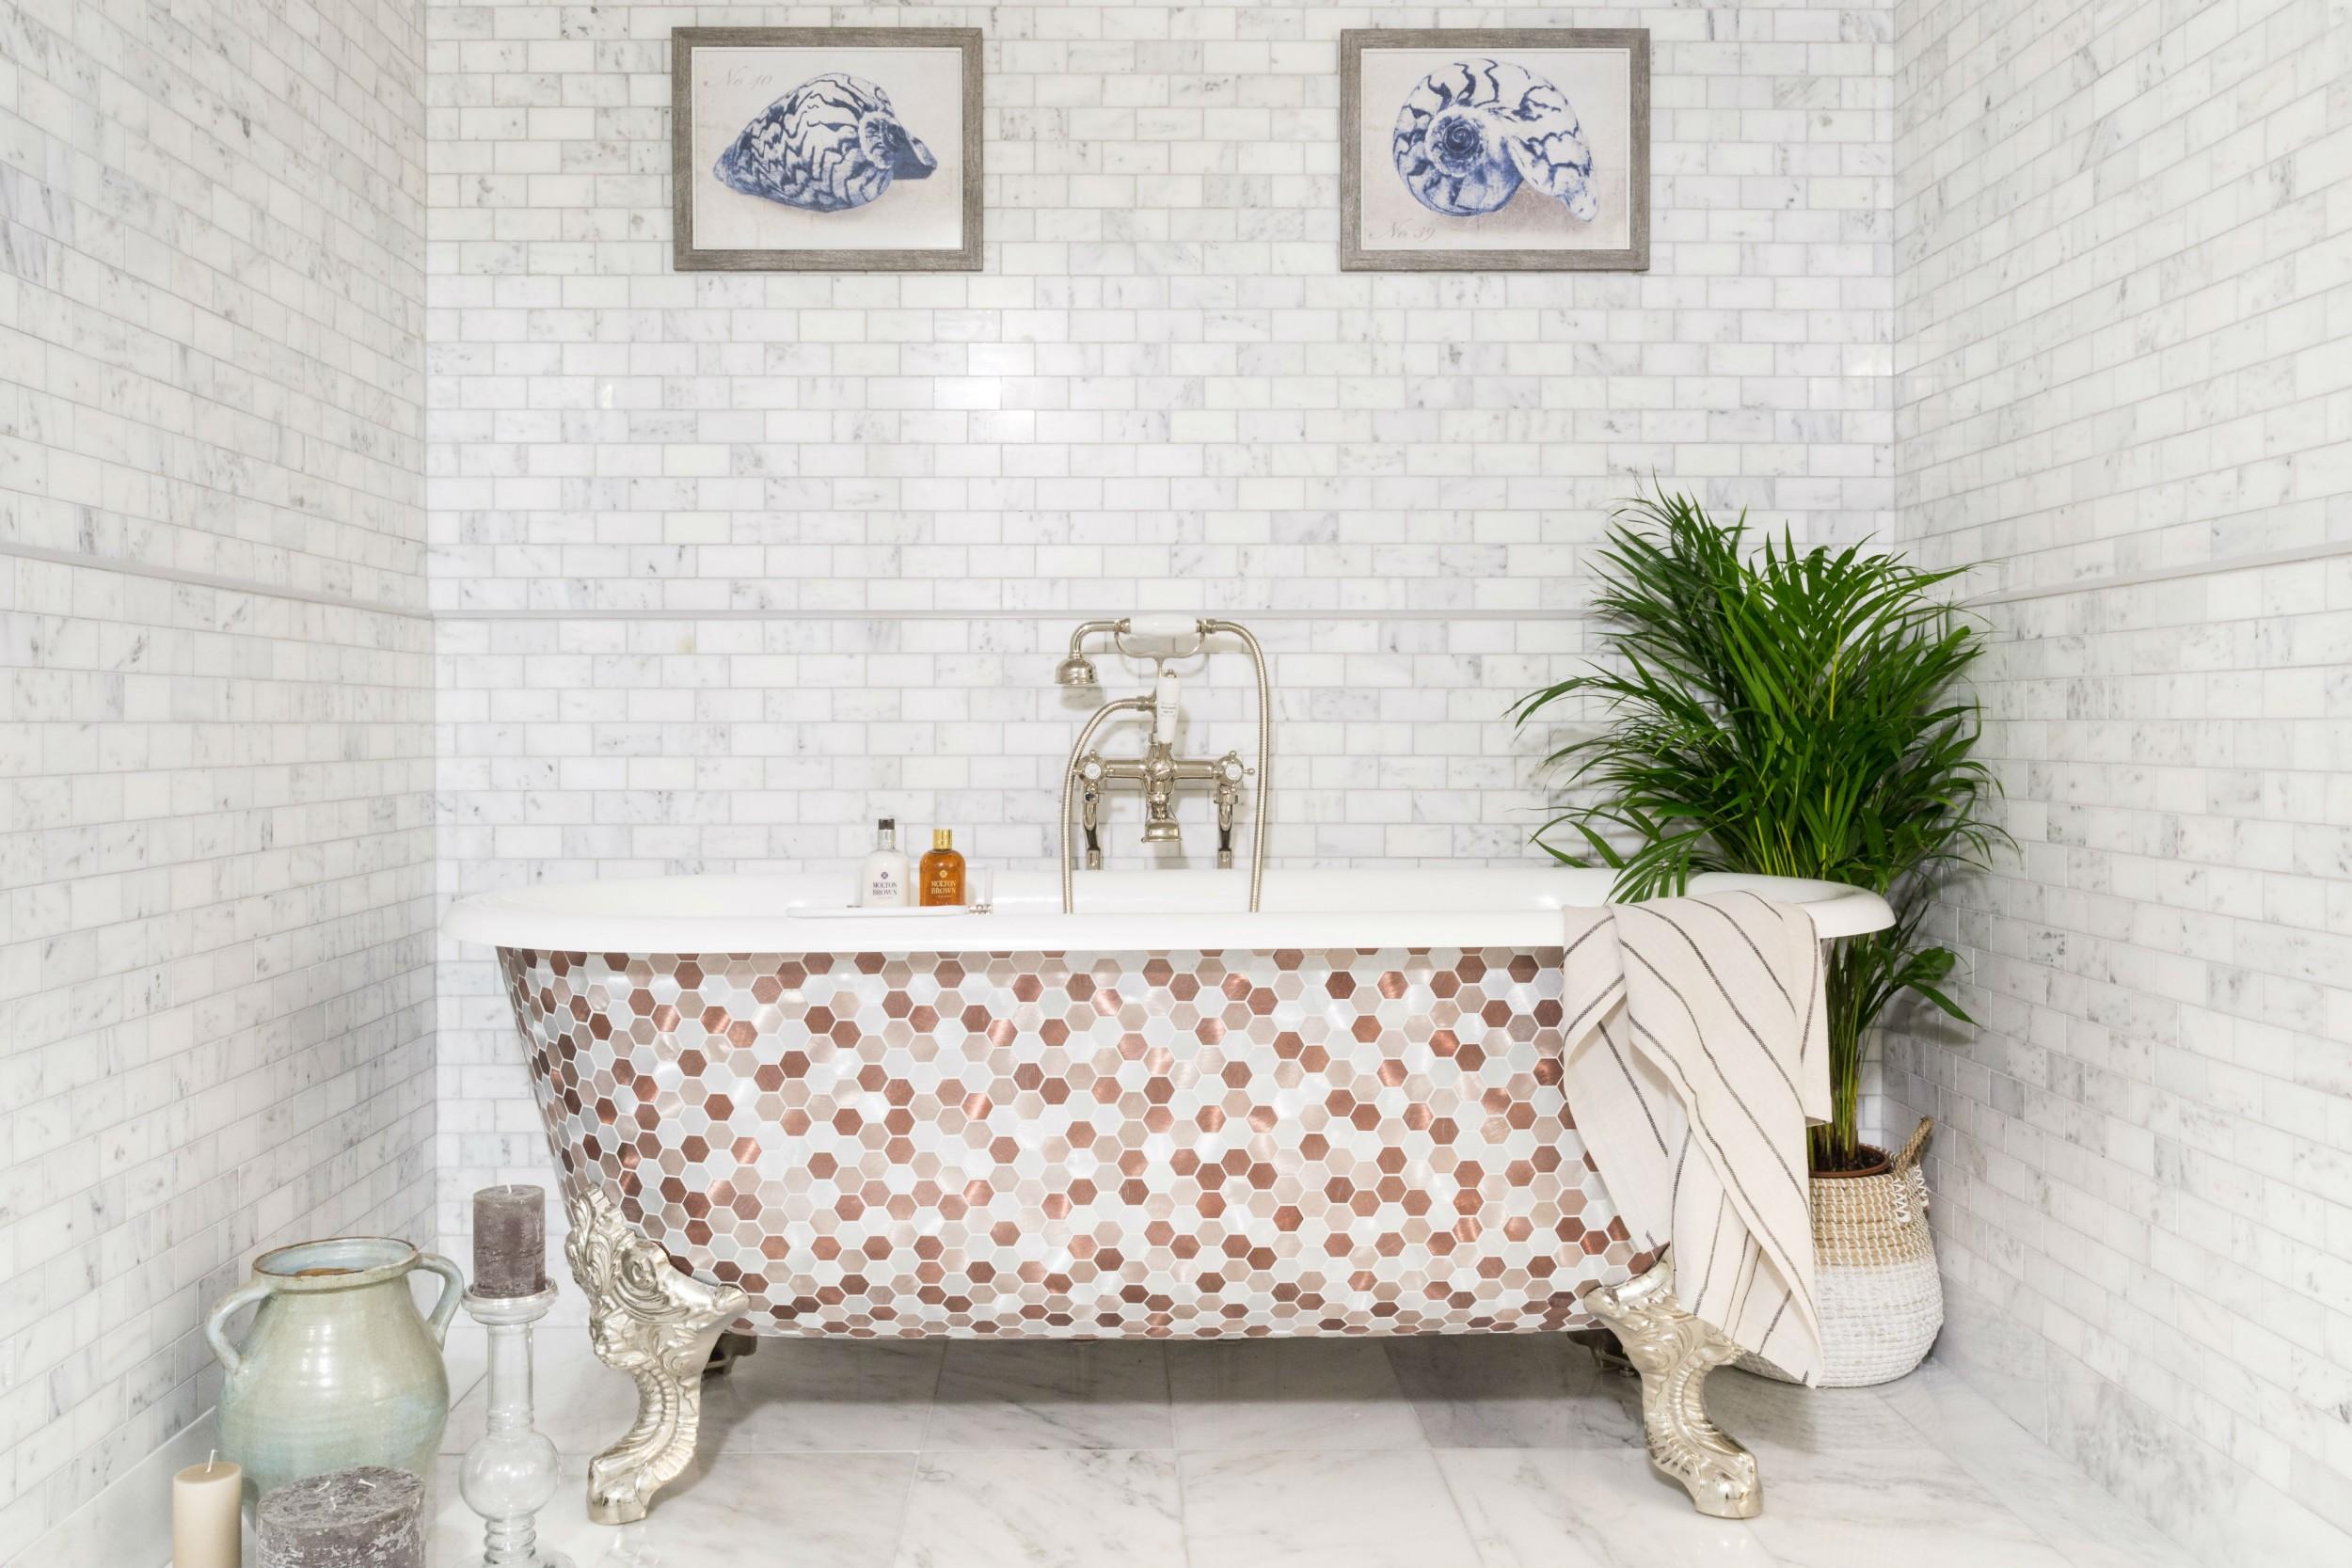 free standing bathtub with metal mosaic